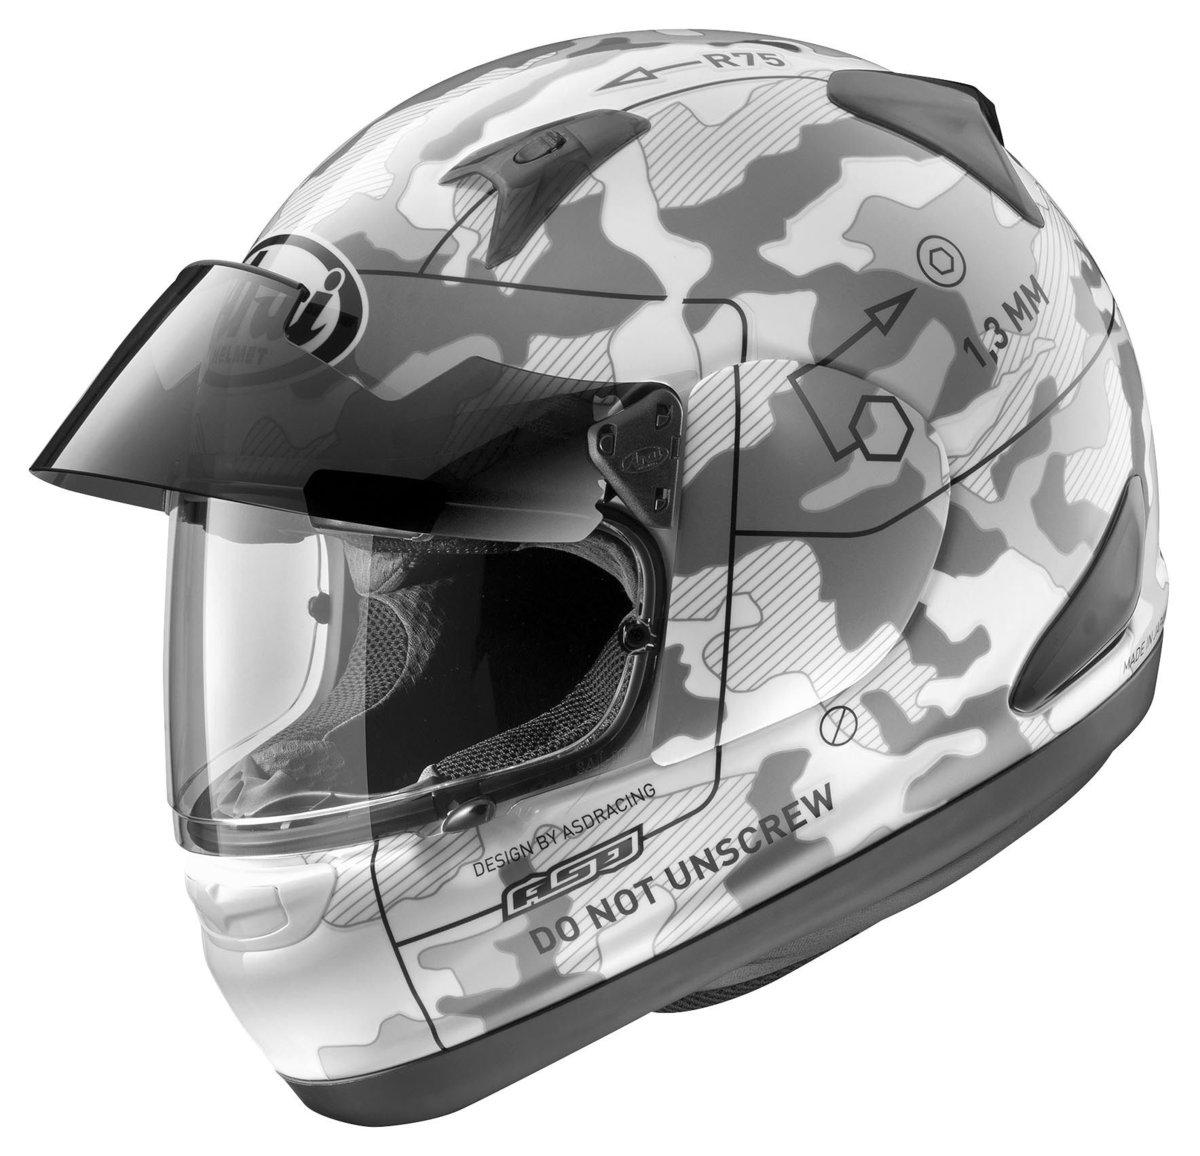 arai_signet_q_pro_tour_tactical_helmet_white.jpg